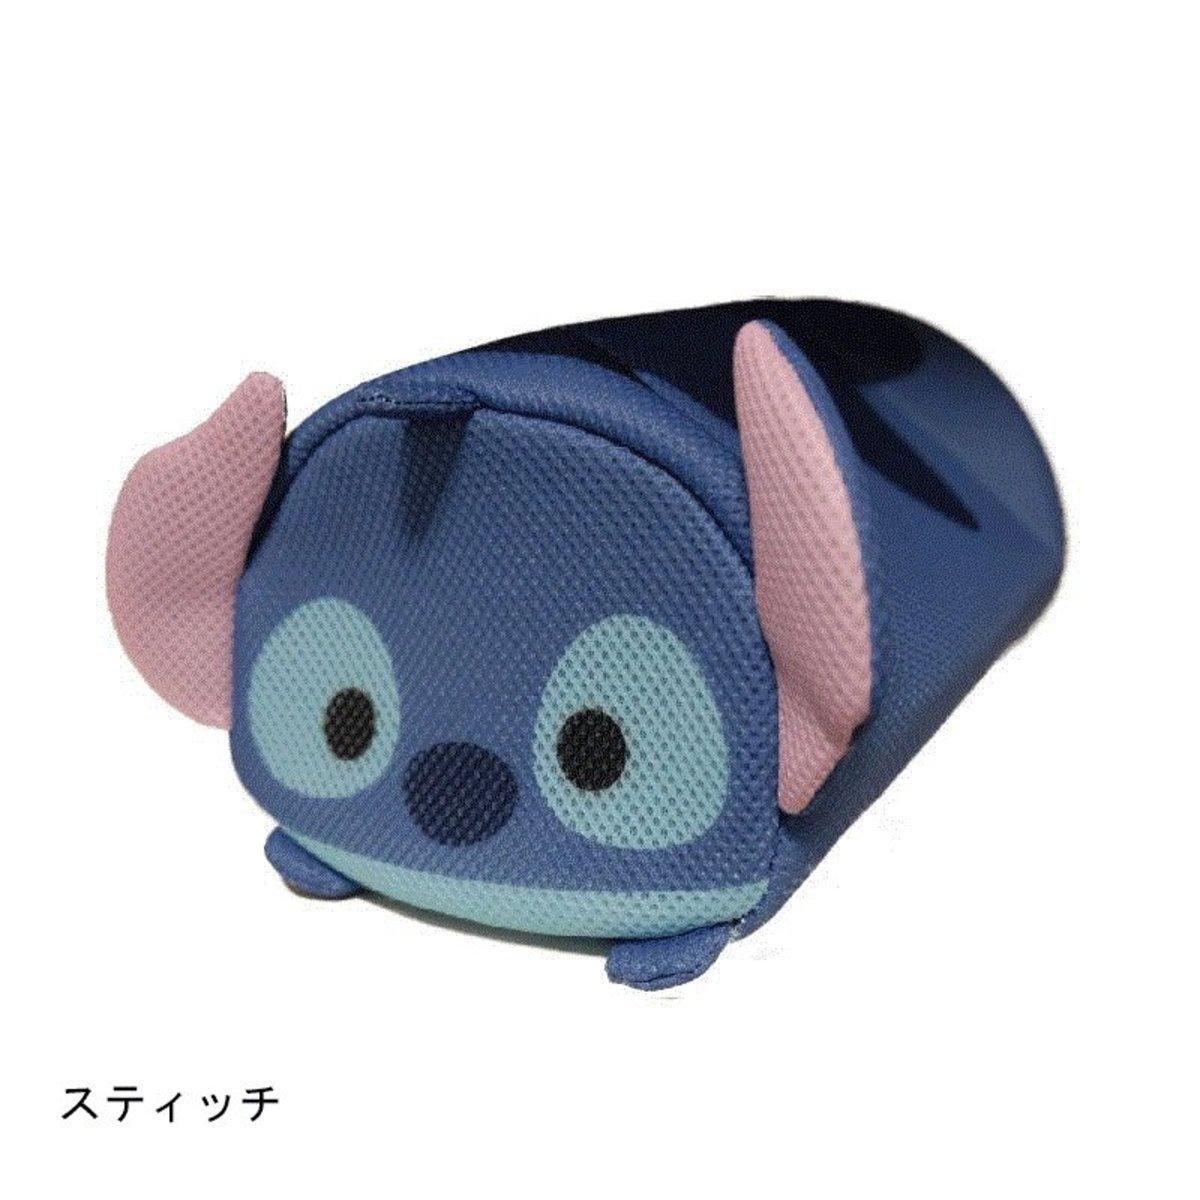 Made in Japan Disney Tsum Tsum Laundry Net - Stitch